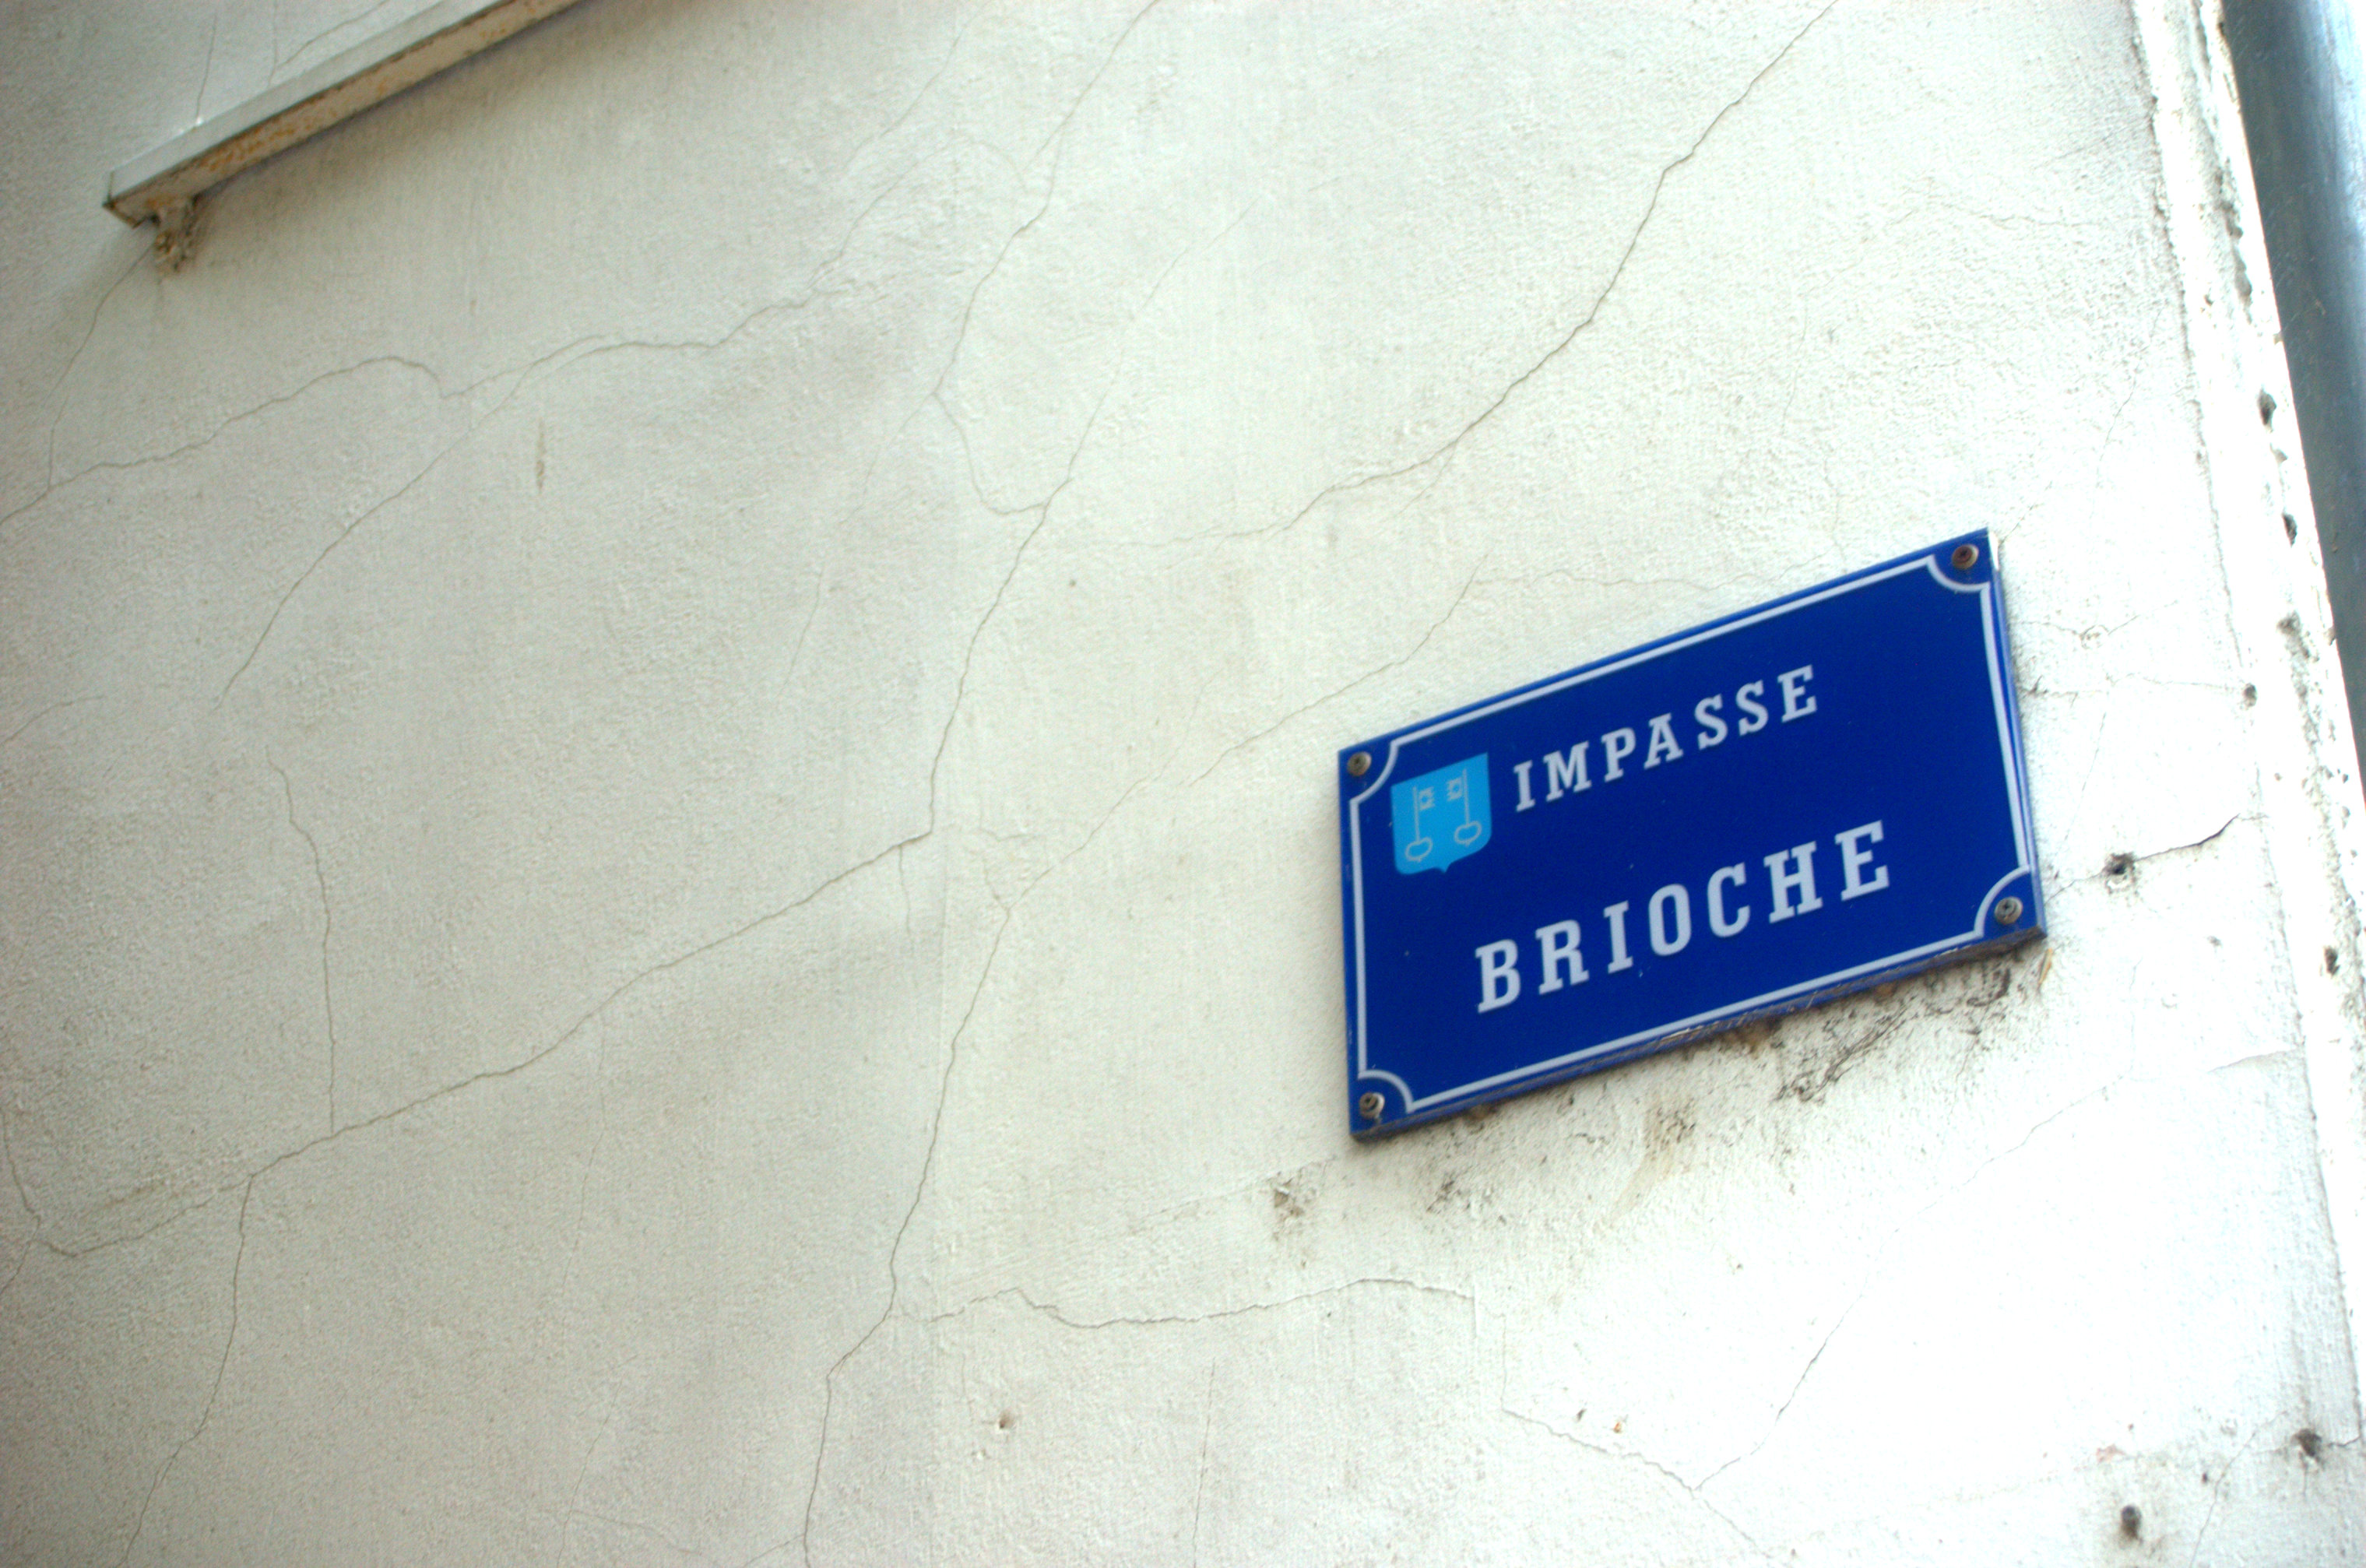 Impasse Brioche